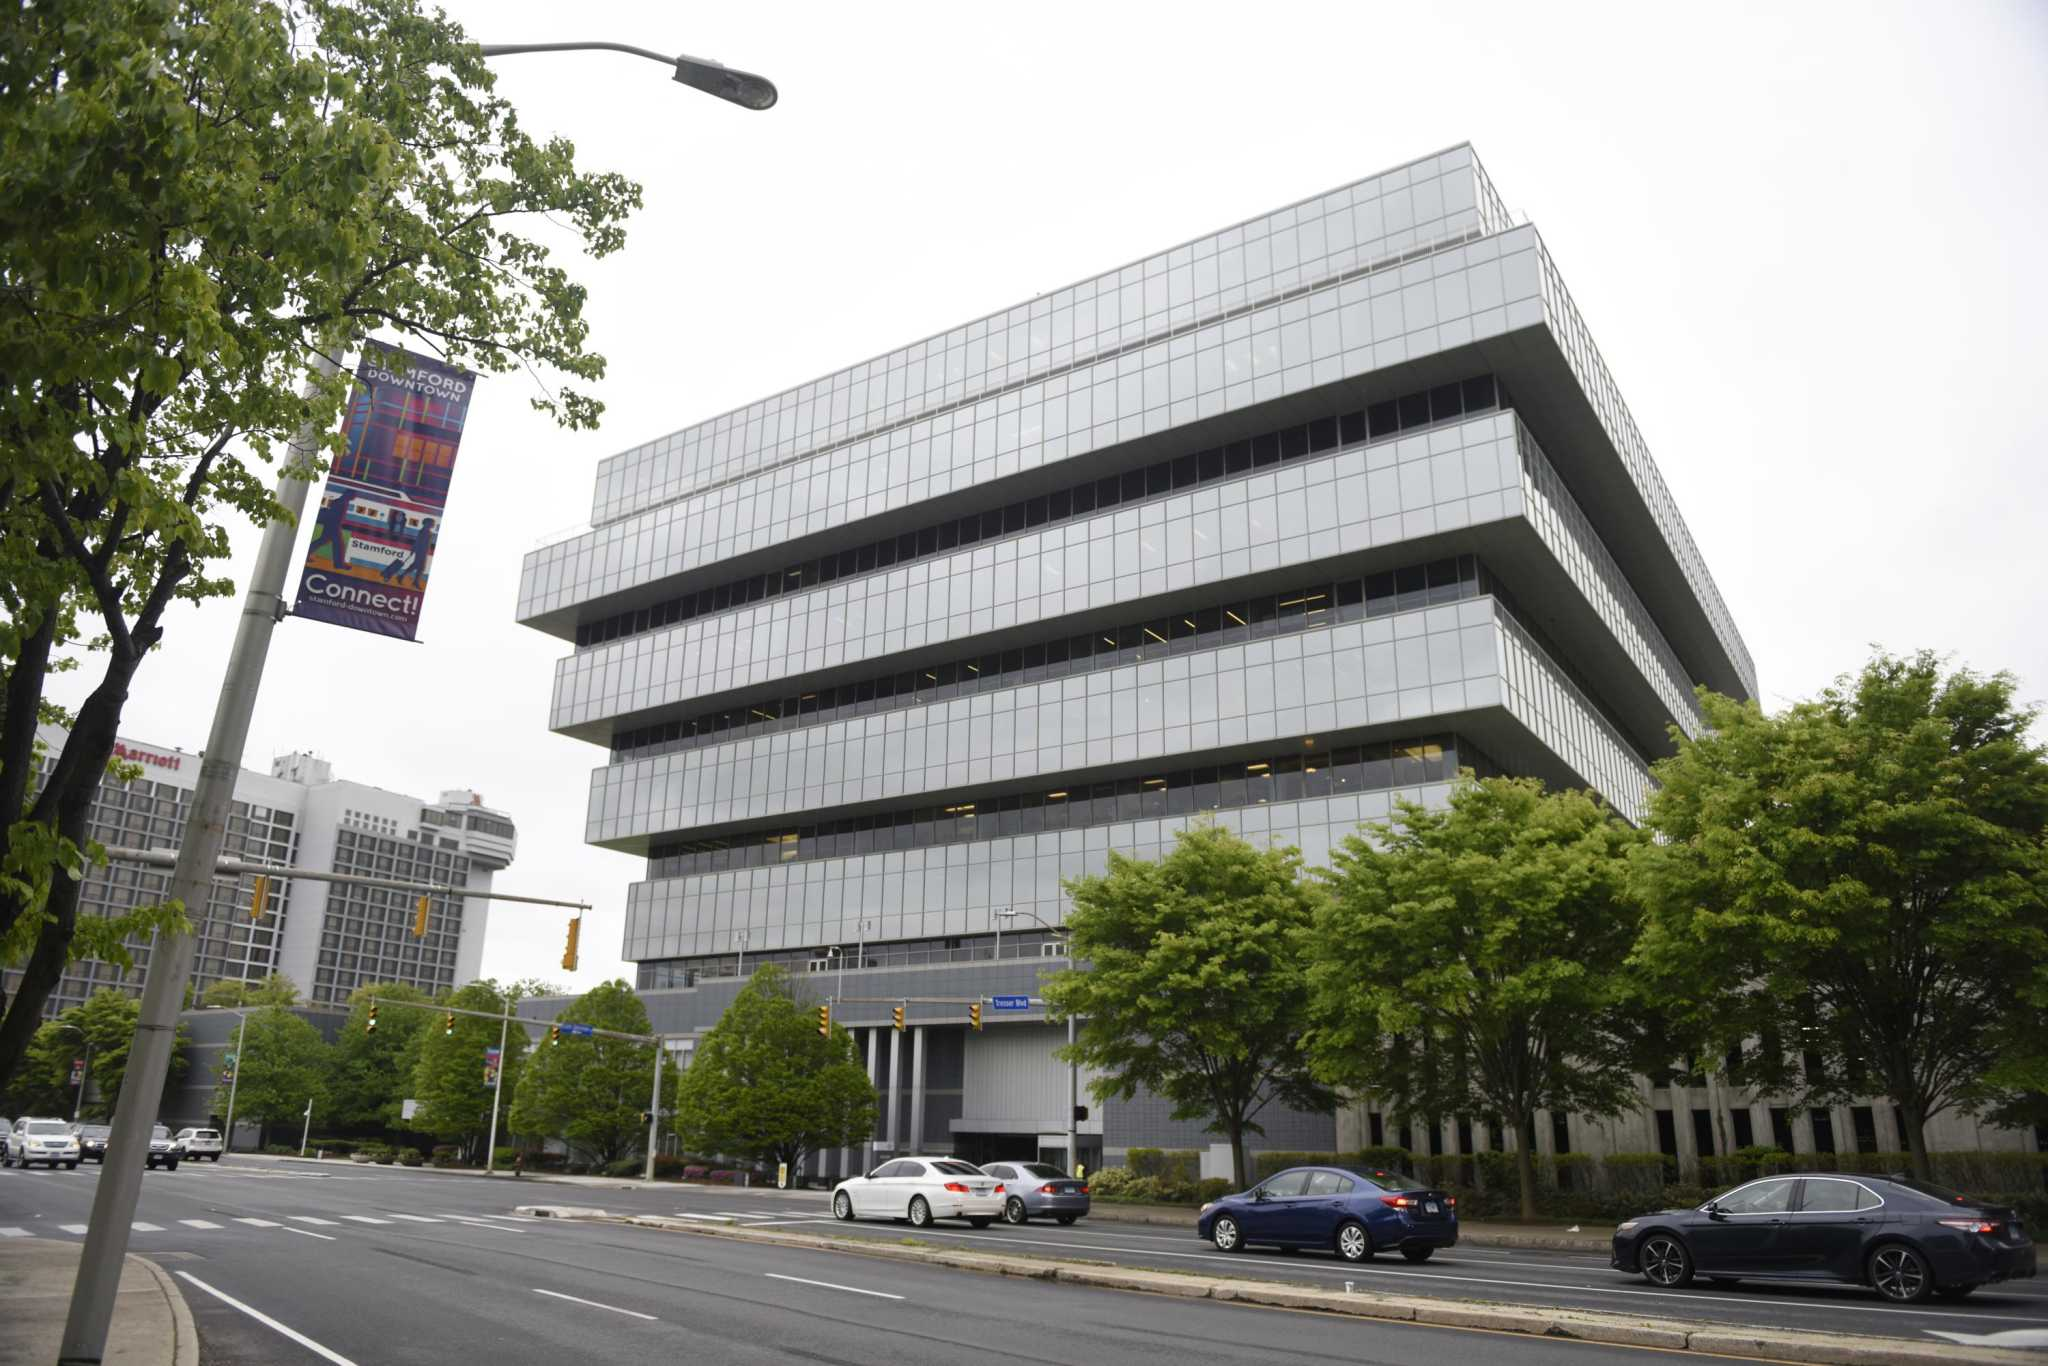 OxyContin maker Purdue Pharma to close North Carolina facility